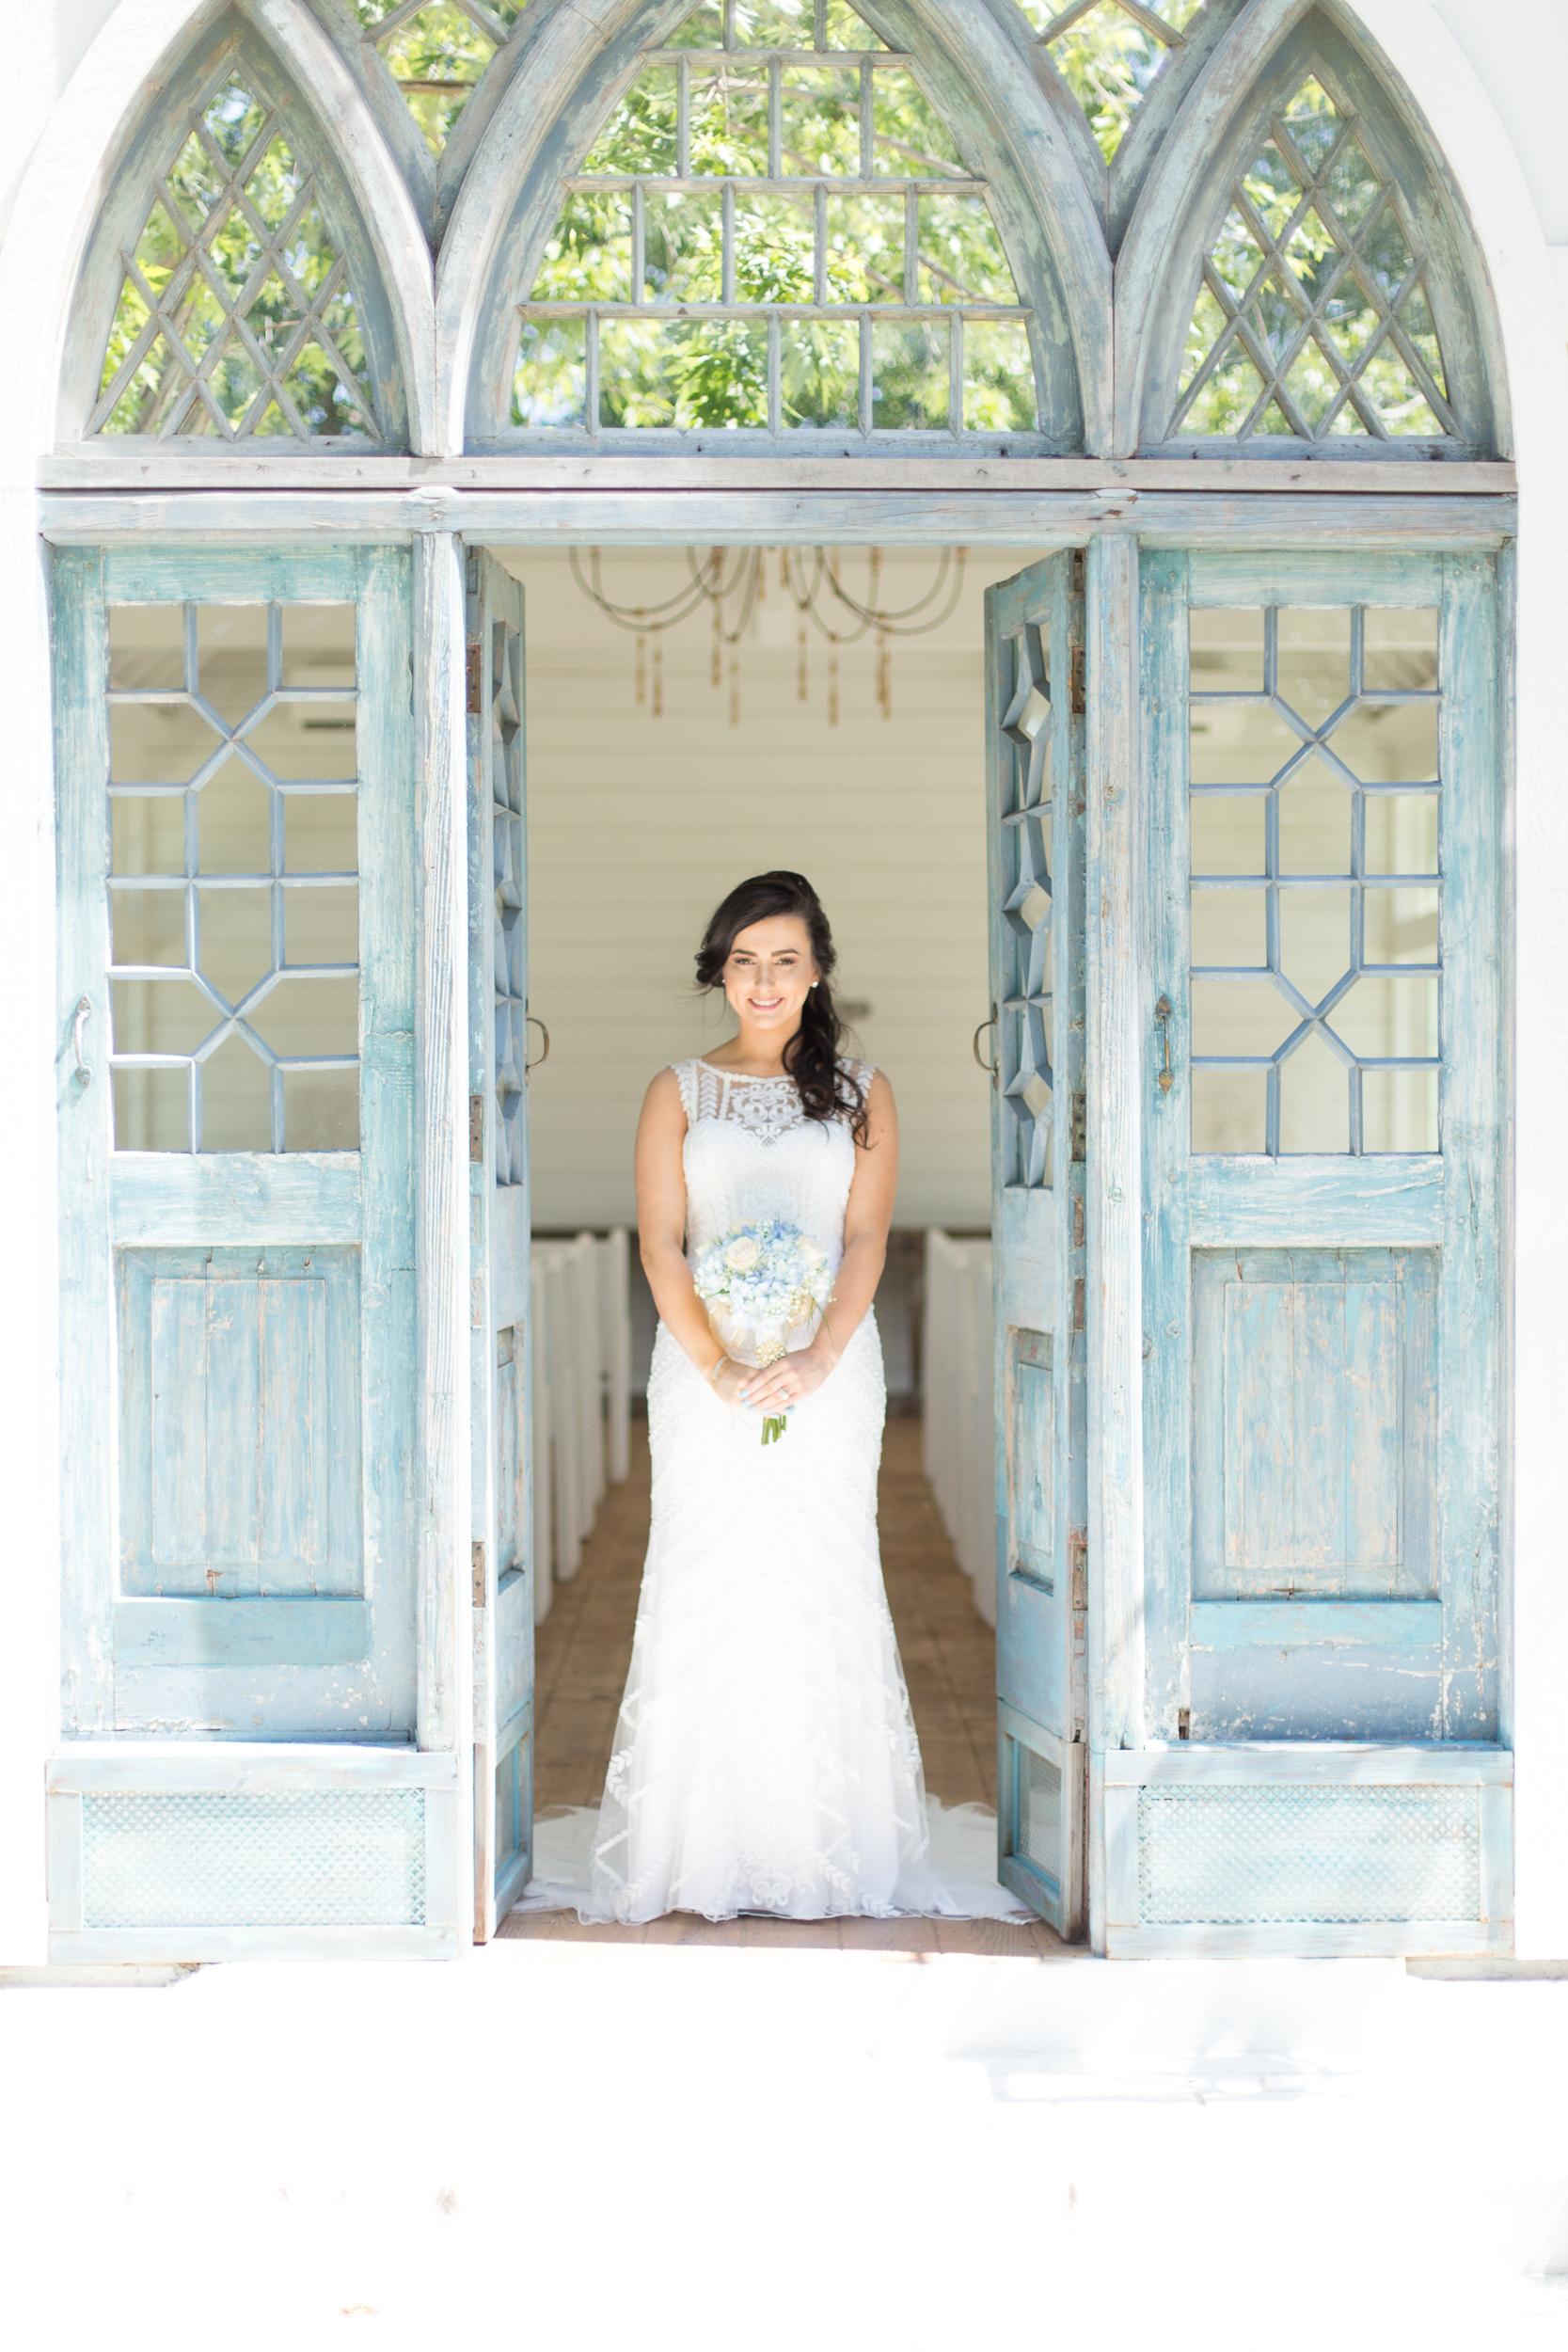 Zihlman-East TX Wedding_Kelsie Hendricks Photography_The Folmar Tyler Texas-77.jpg